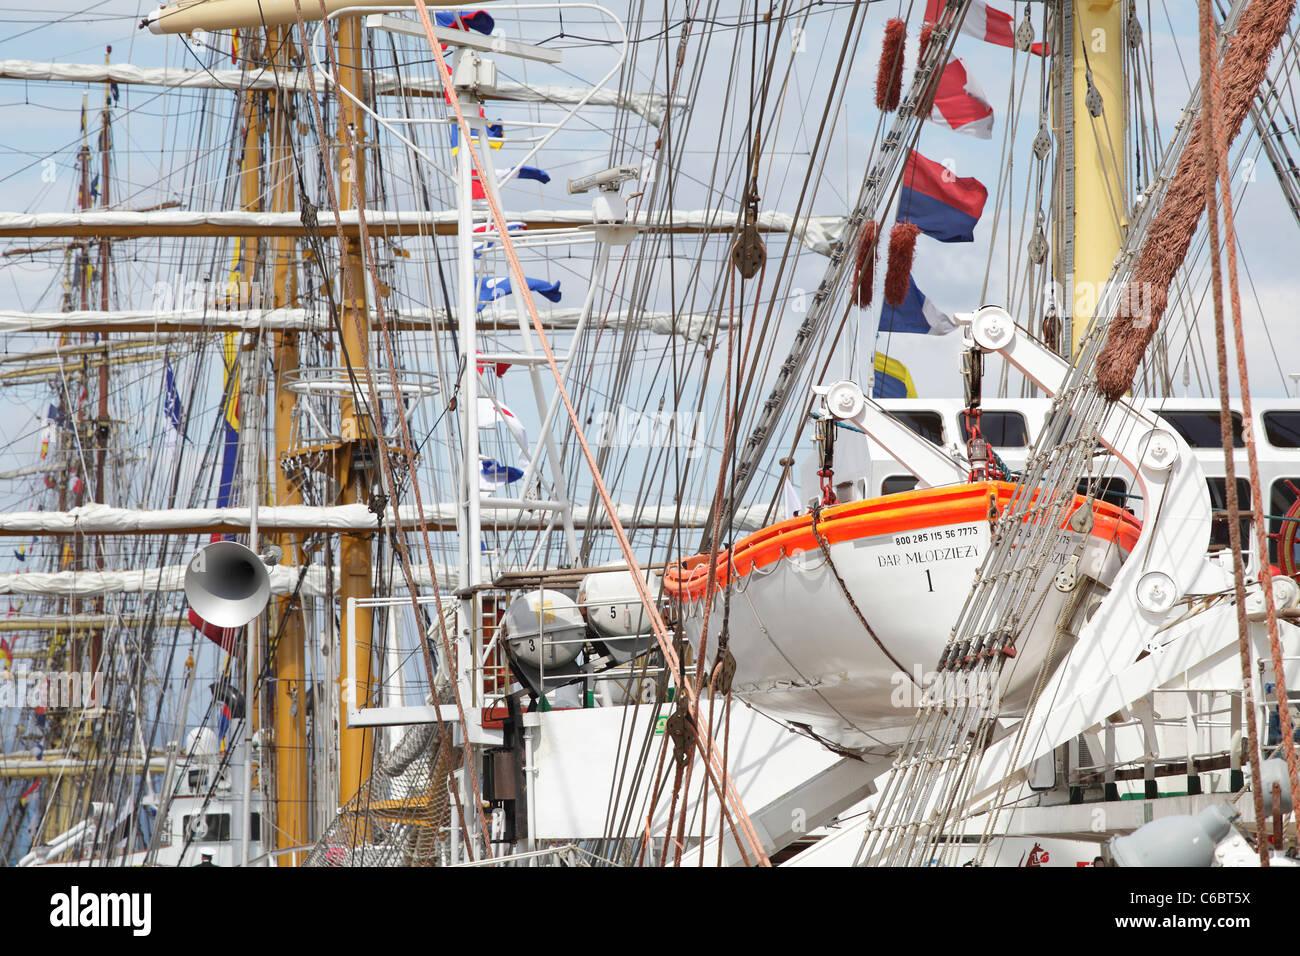 Ships berthed at the Tall Ships Race 2011 in Greenock, Scotland, UK - Stock Image